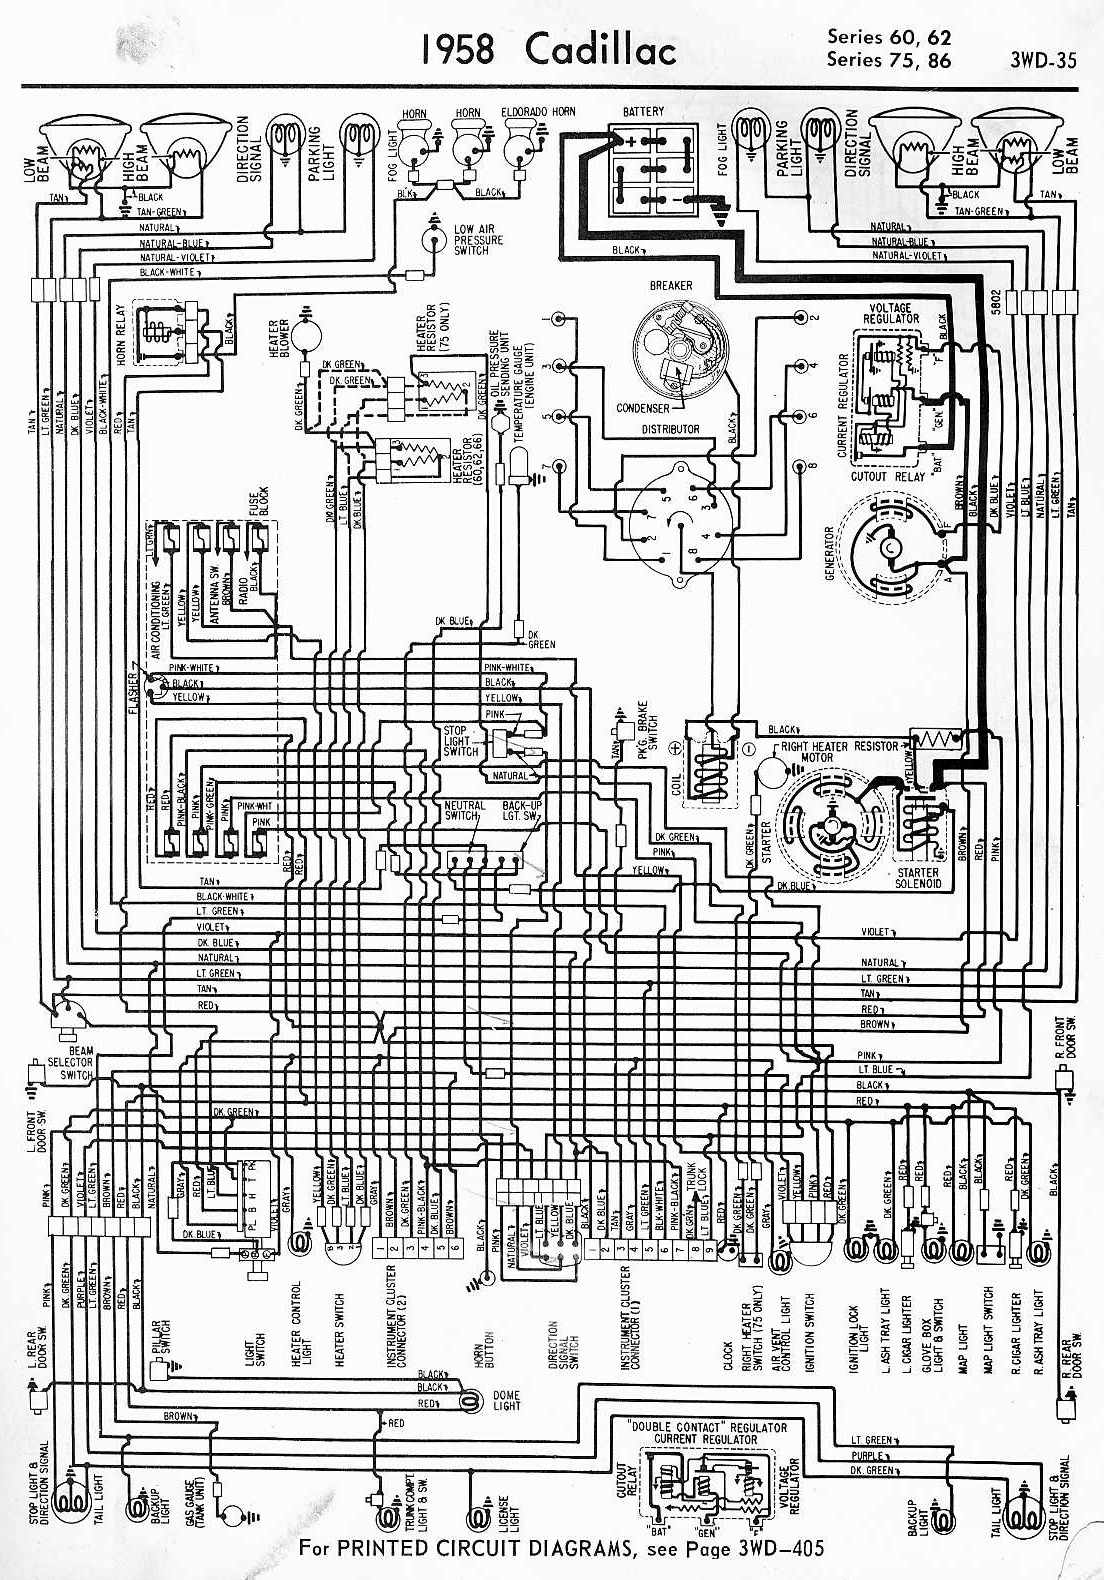 Wiring Diagram For 1960 Edsel 6 All Models